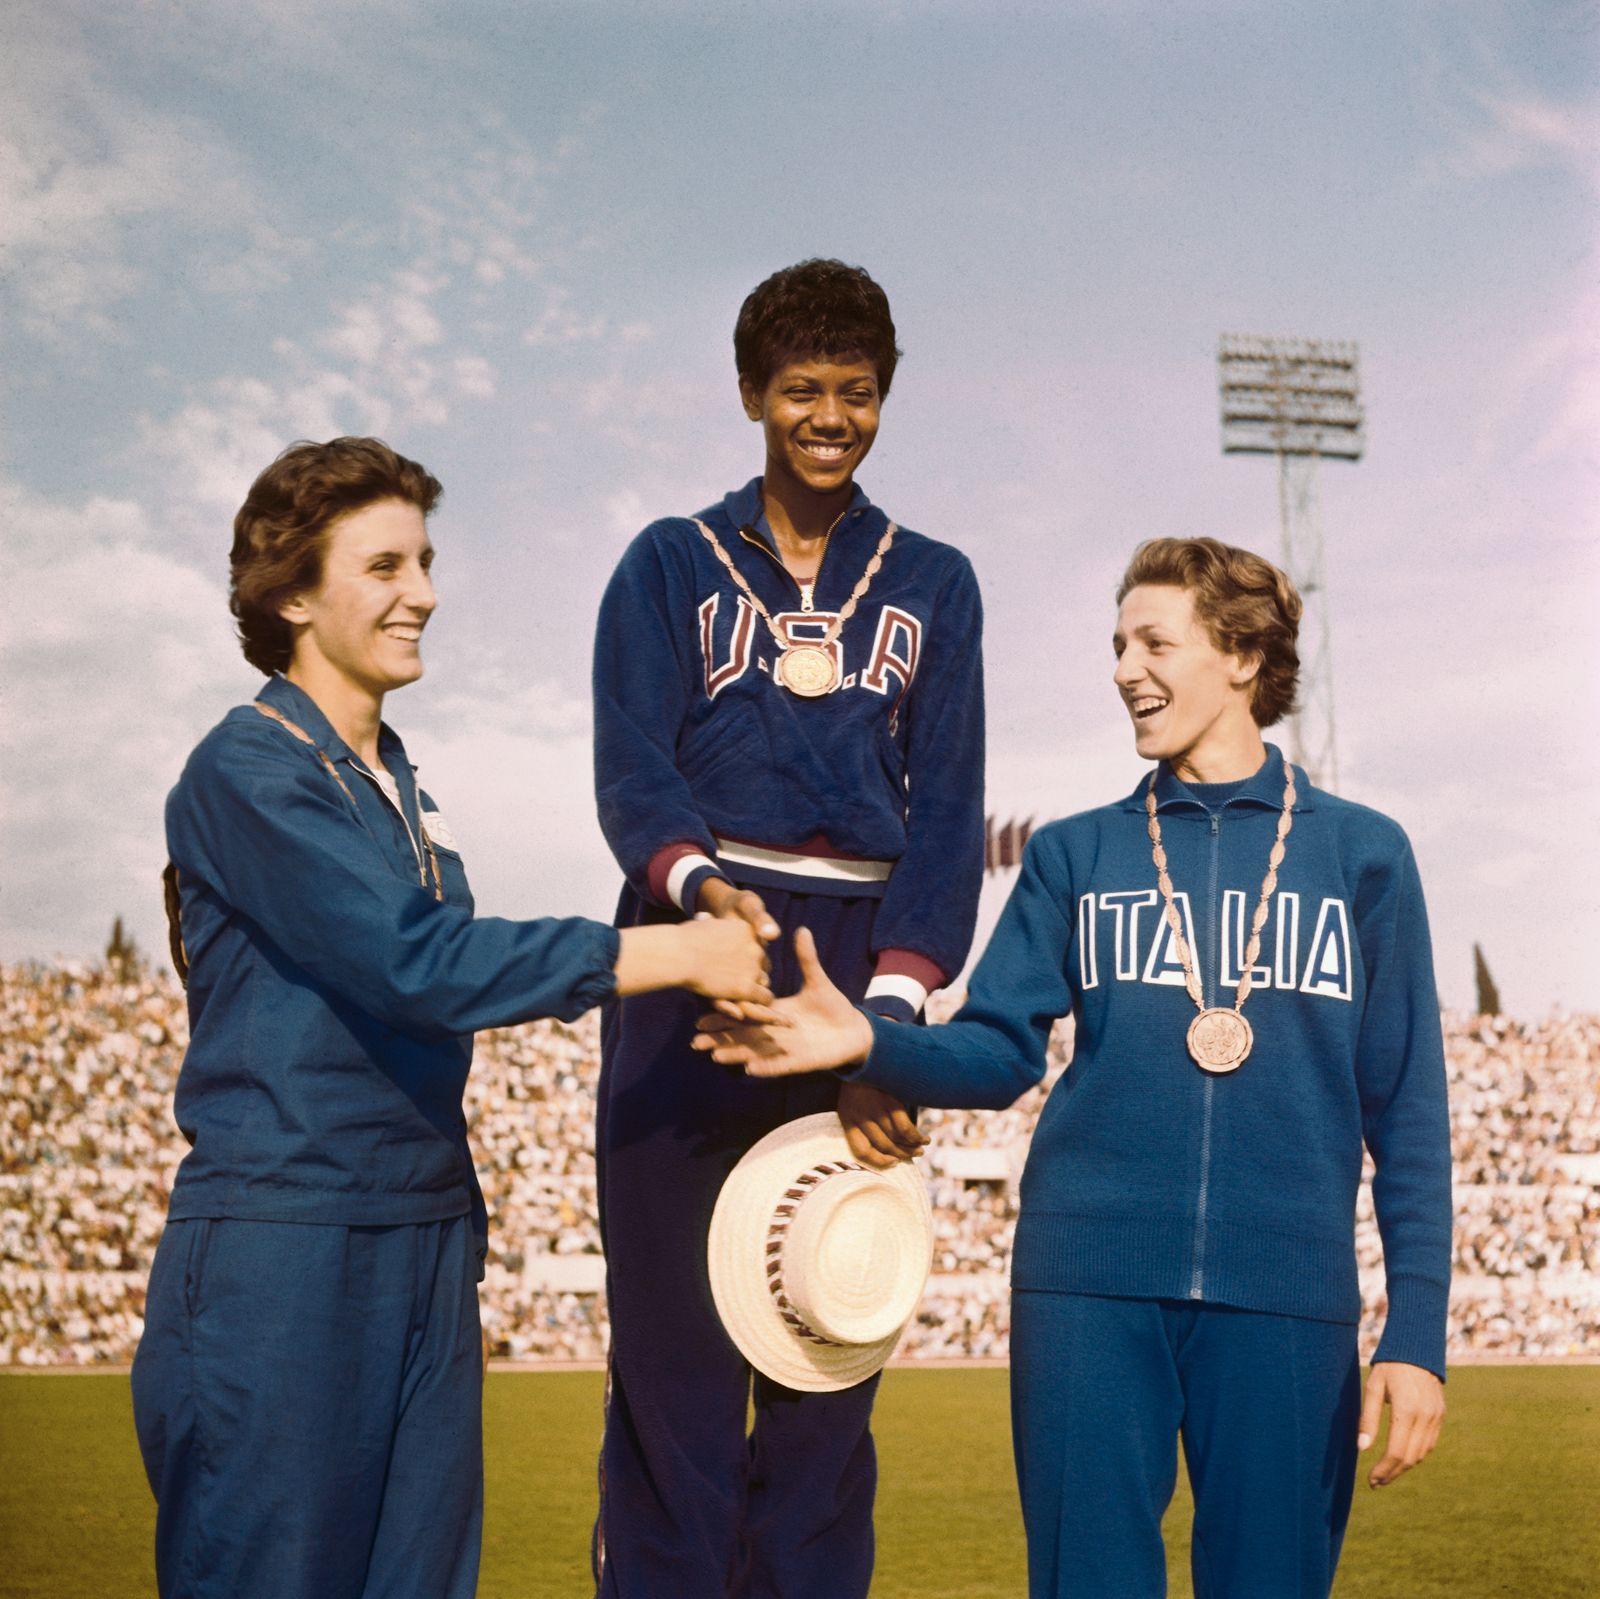 Dorothy Hyman, Wilma Rudolph, Giusseppina Leone Shaking Hands